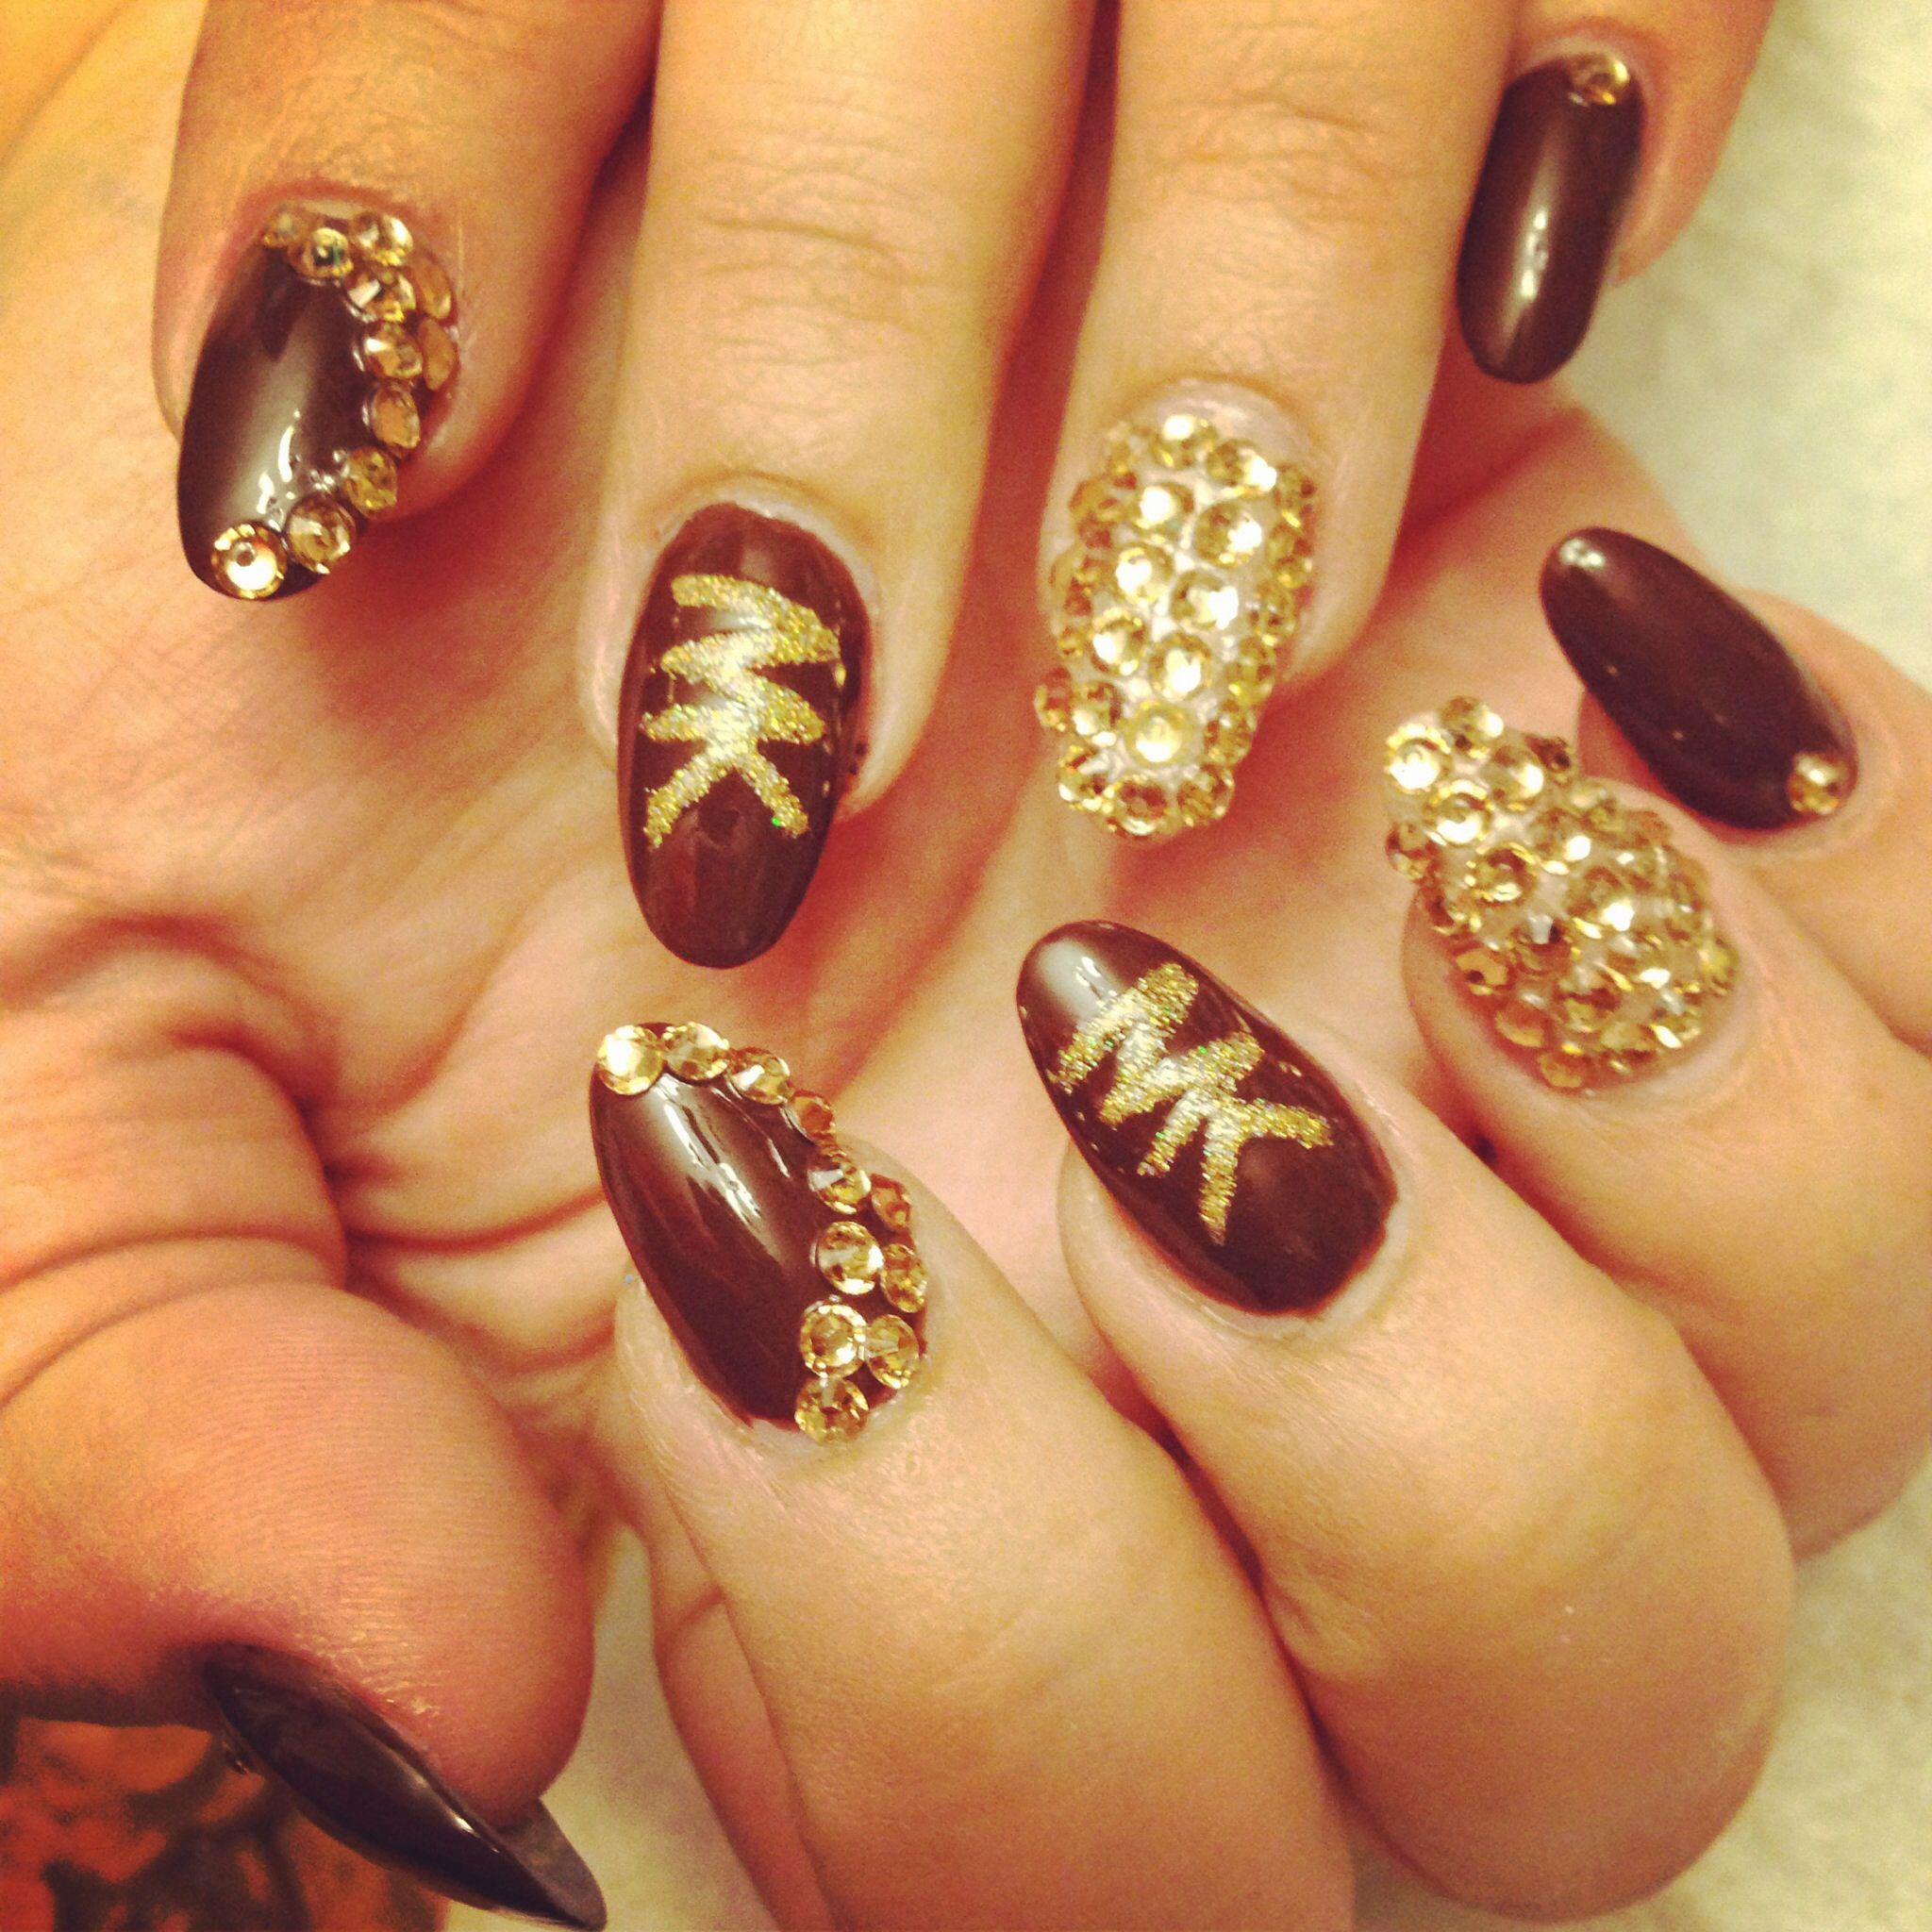 Michael Kors nails | Nails did | Pinterest